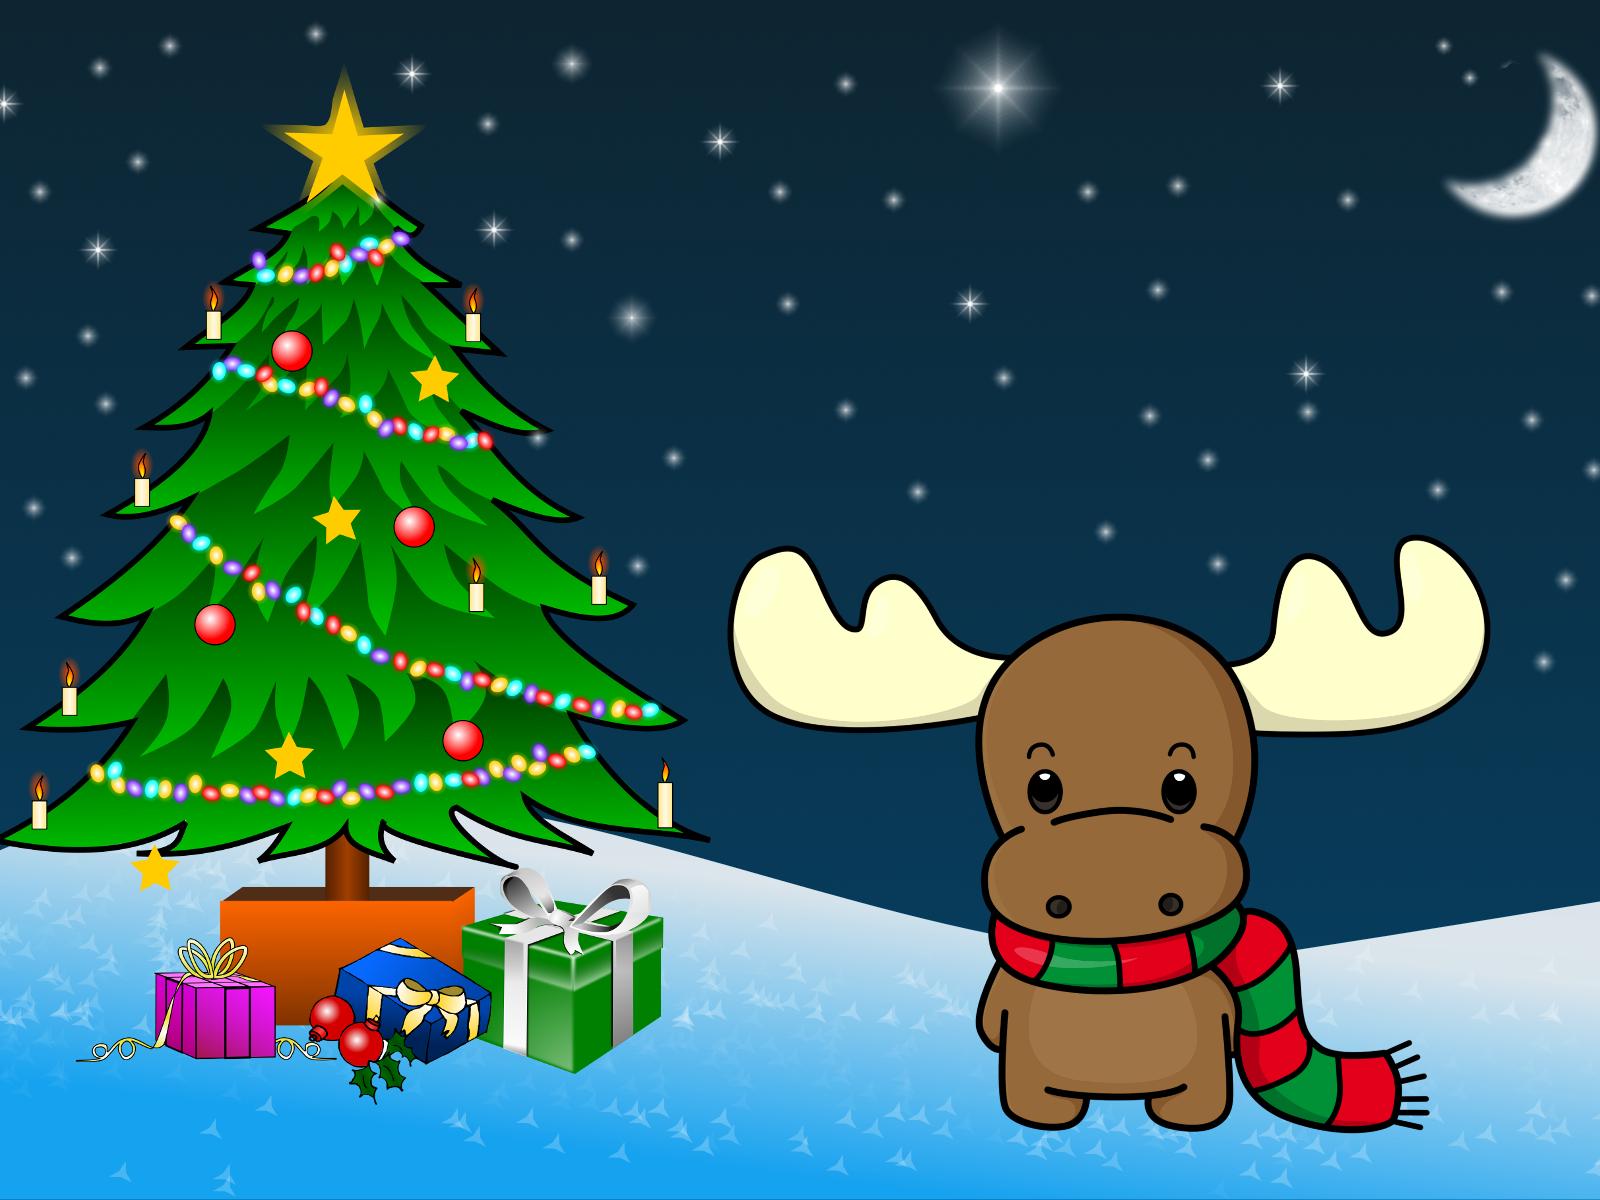 Cute Deer and Christmas Tree Exclusive HD Wallpapers 6040 1600x1200